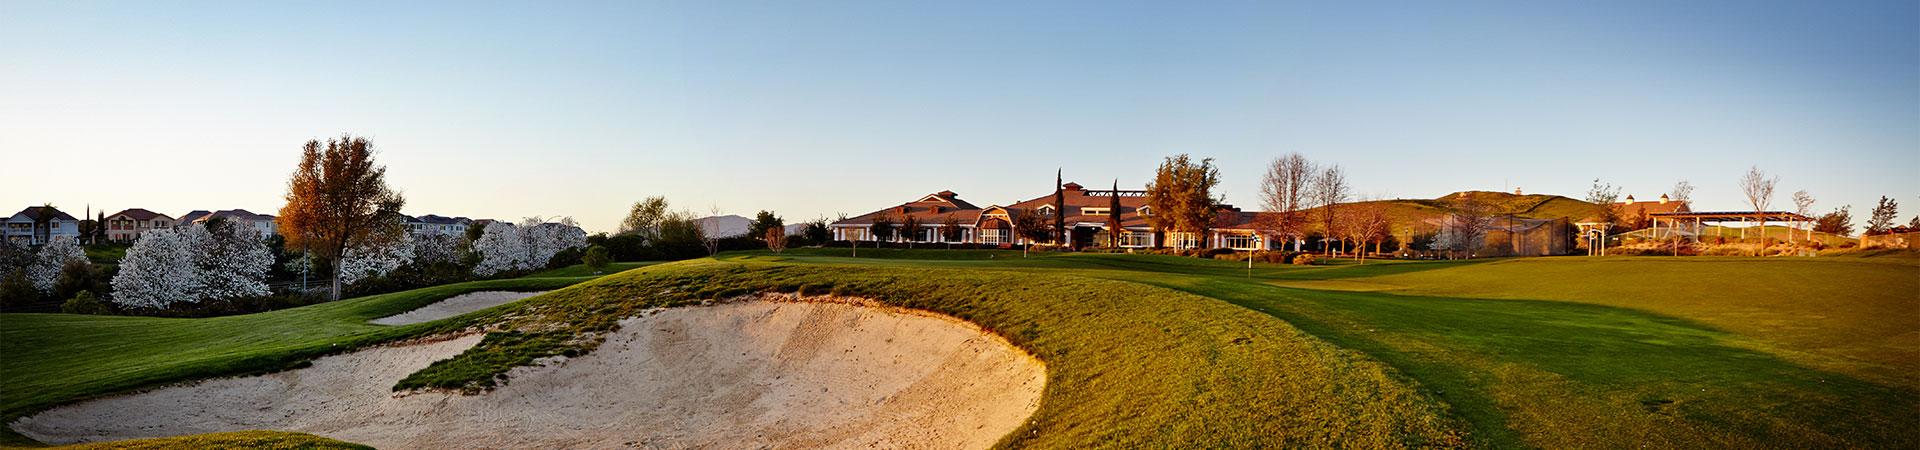 Dublin Ranch Golf Course - Dublin, CA